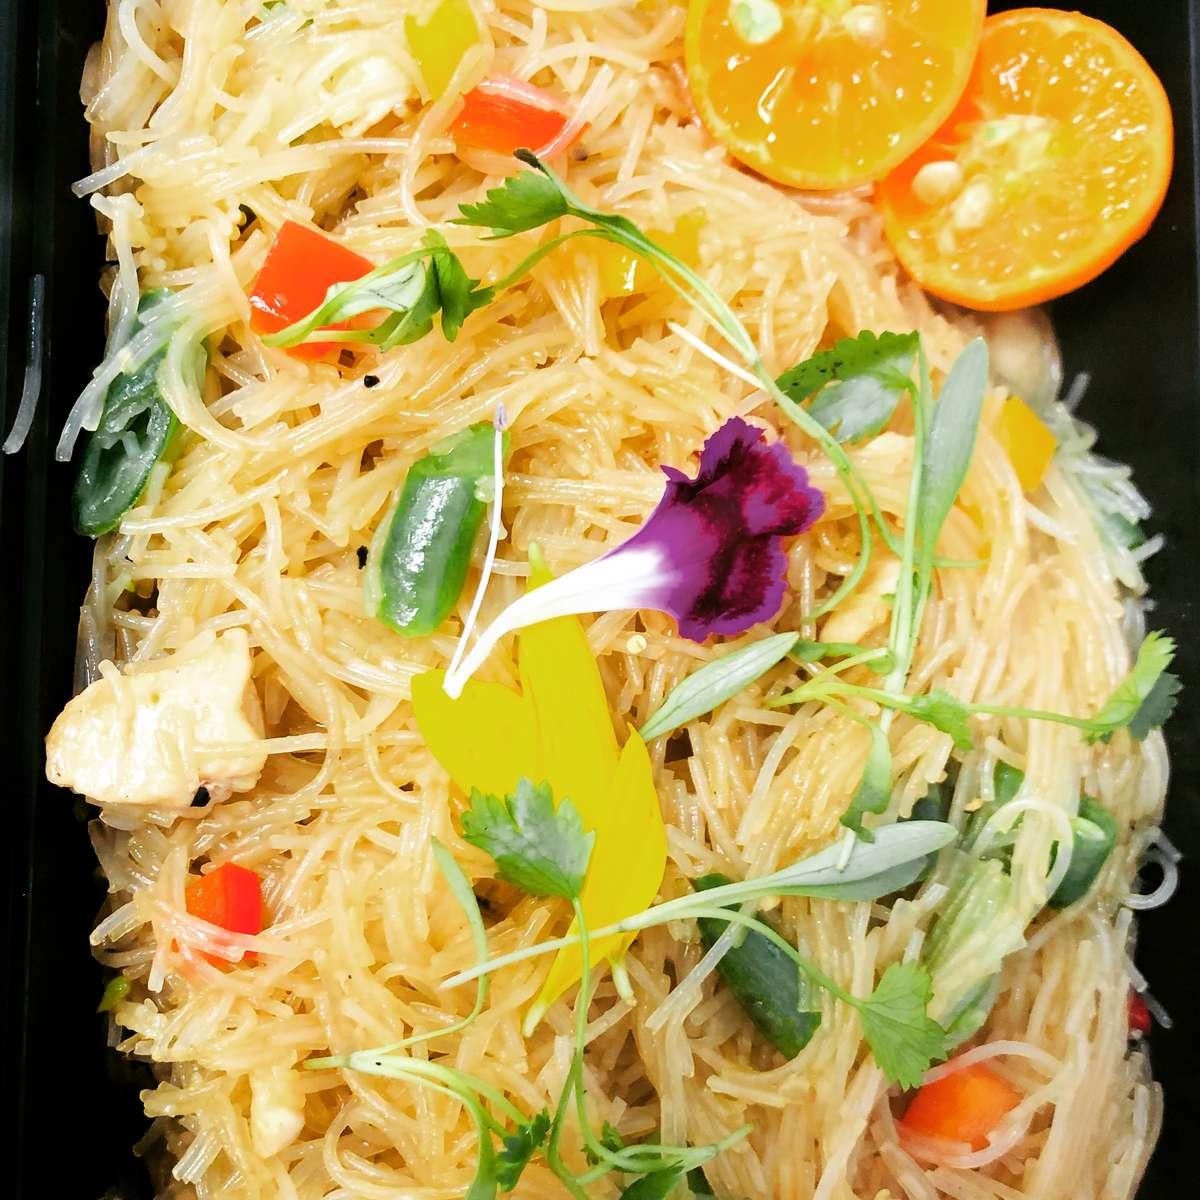 Mama's Pancit Bihon (Stir Fried Rice Stick Noodles)